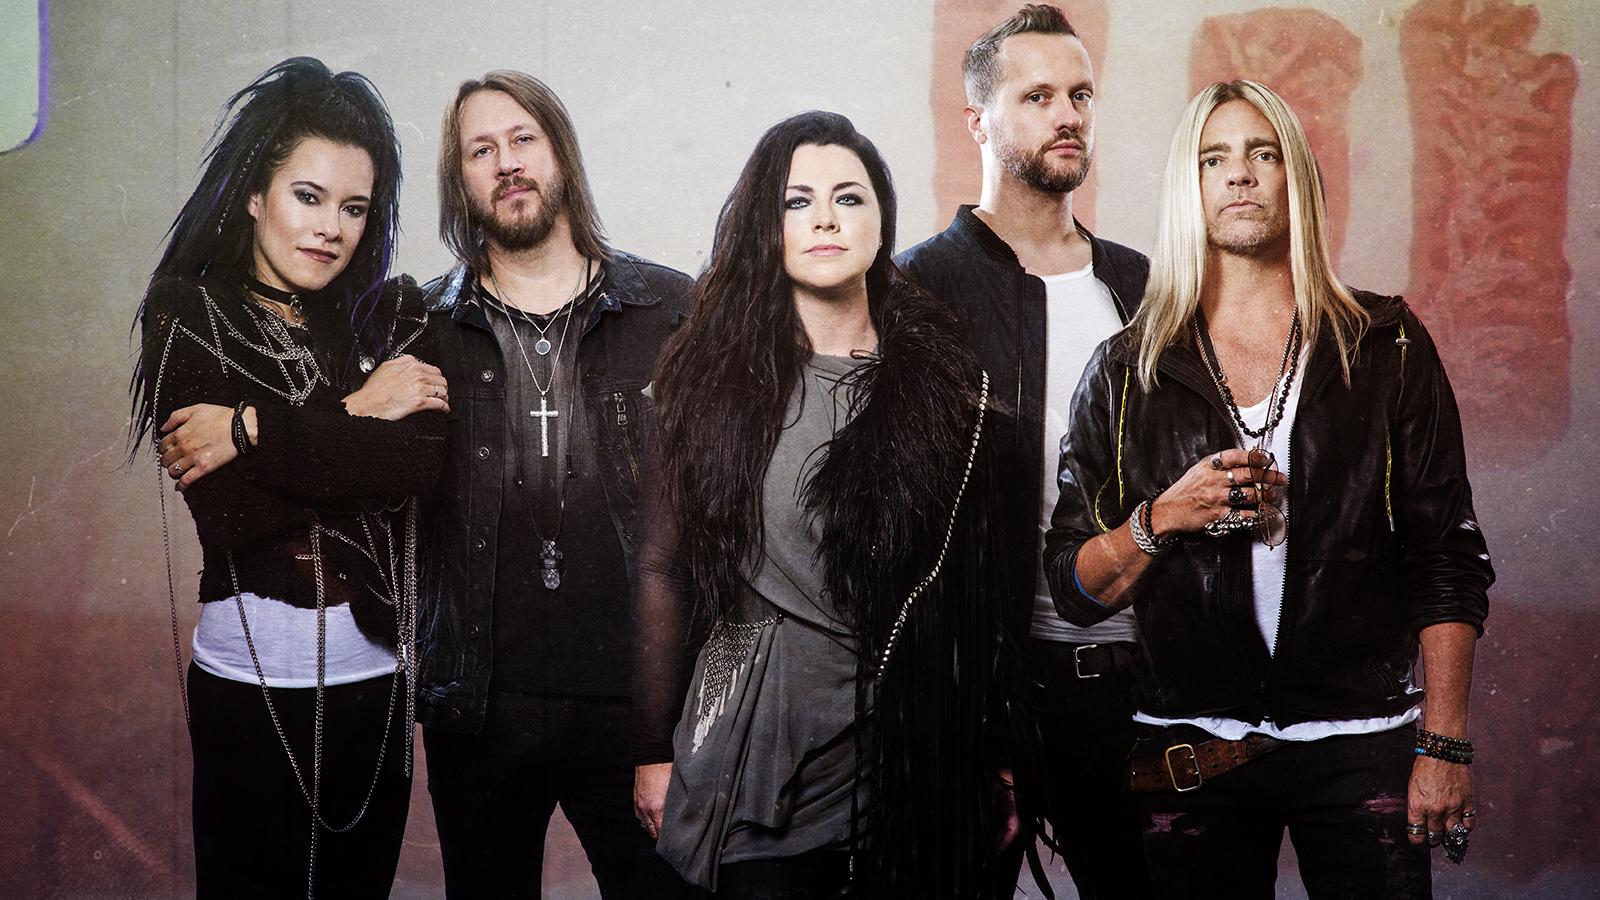 evanescence band artist 2021